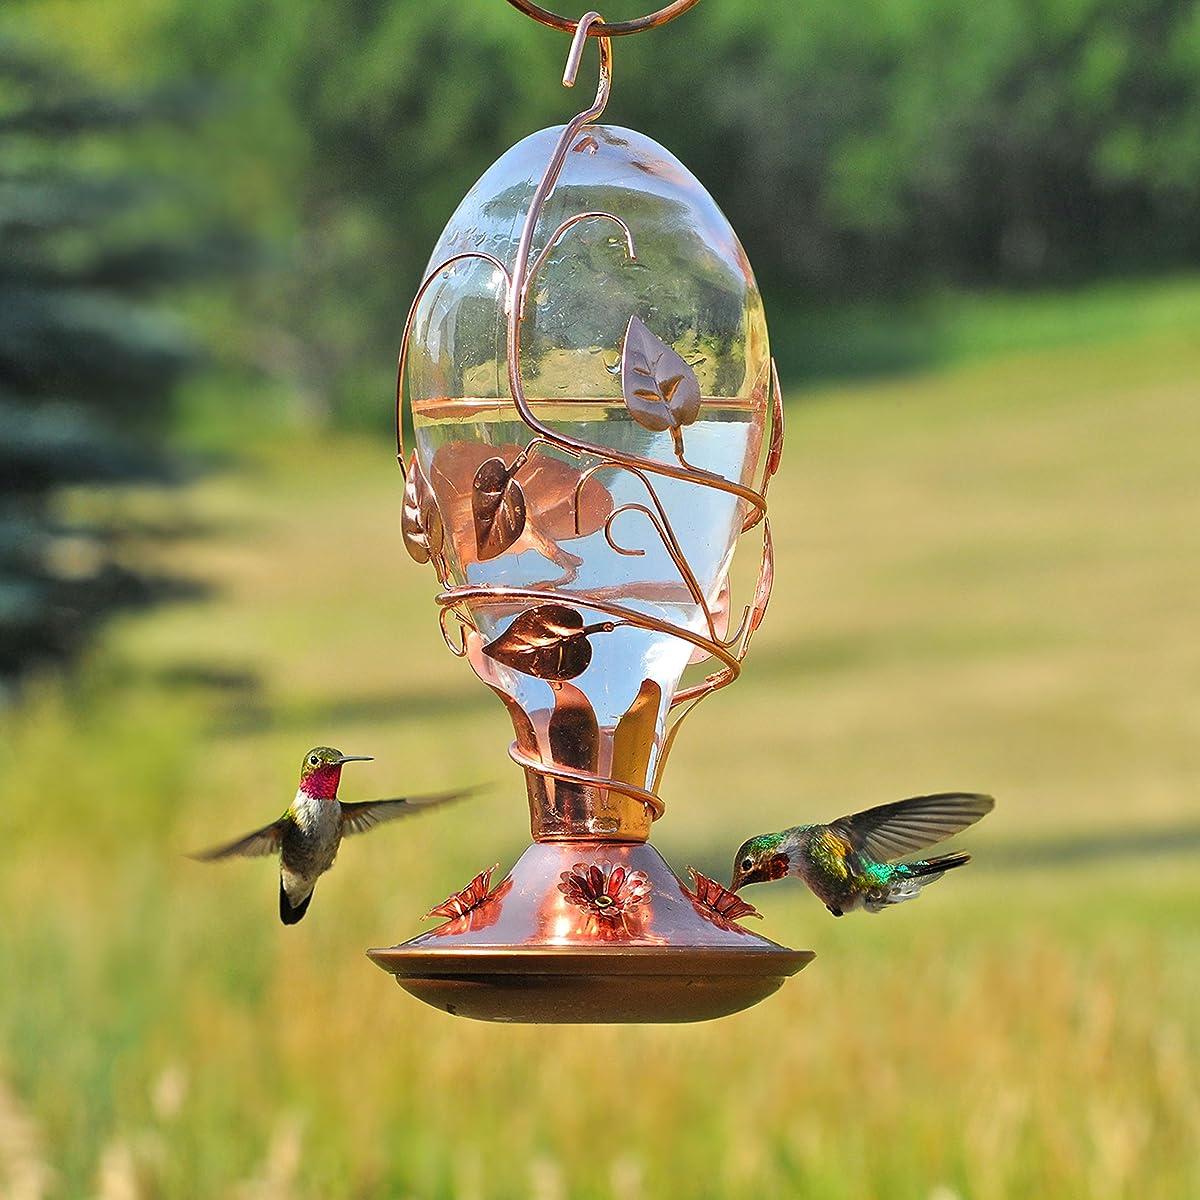 Perky-Pet Looking Glass Hummingbird Feeder